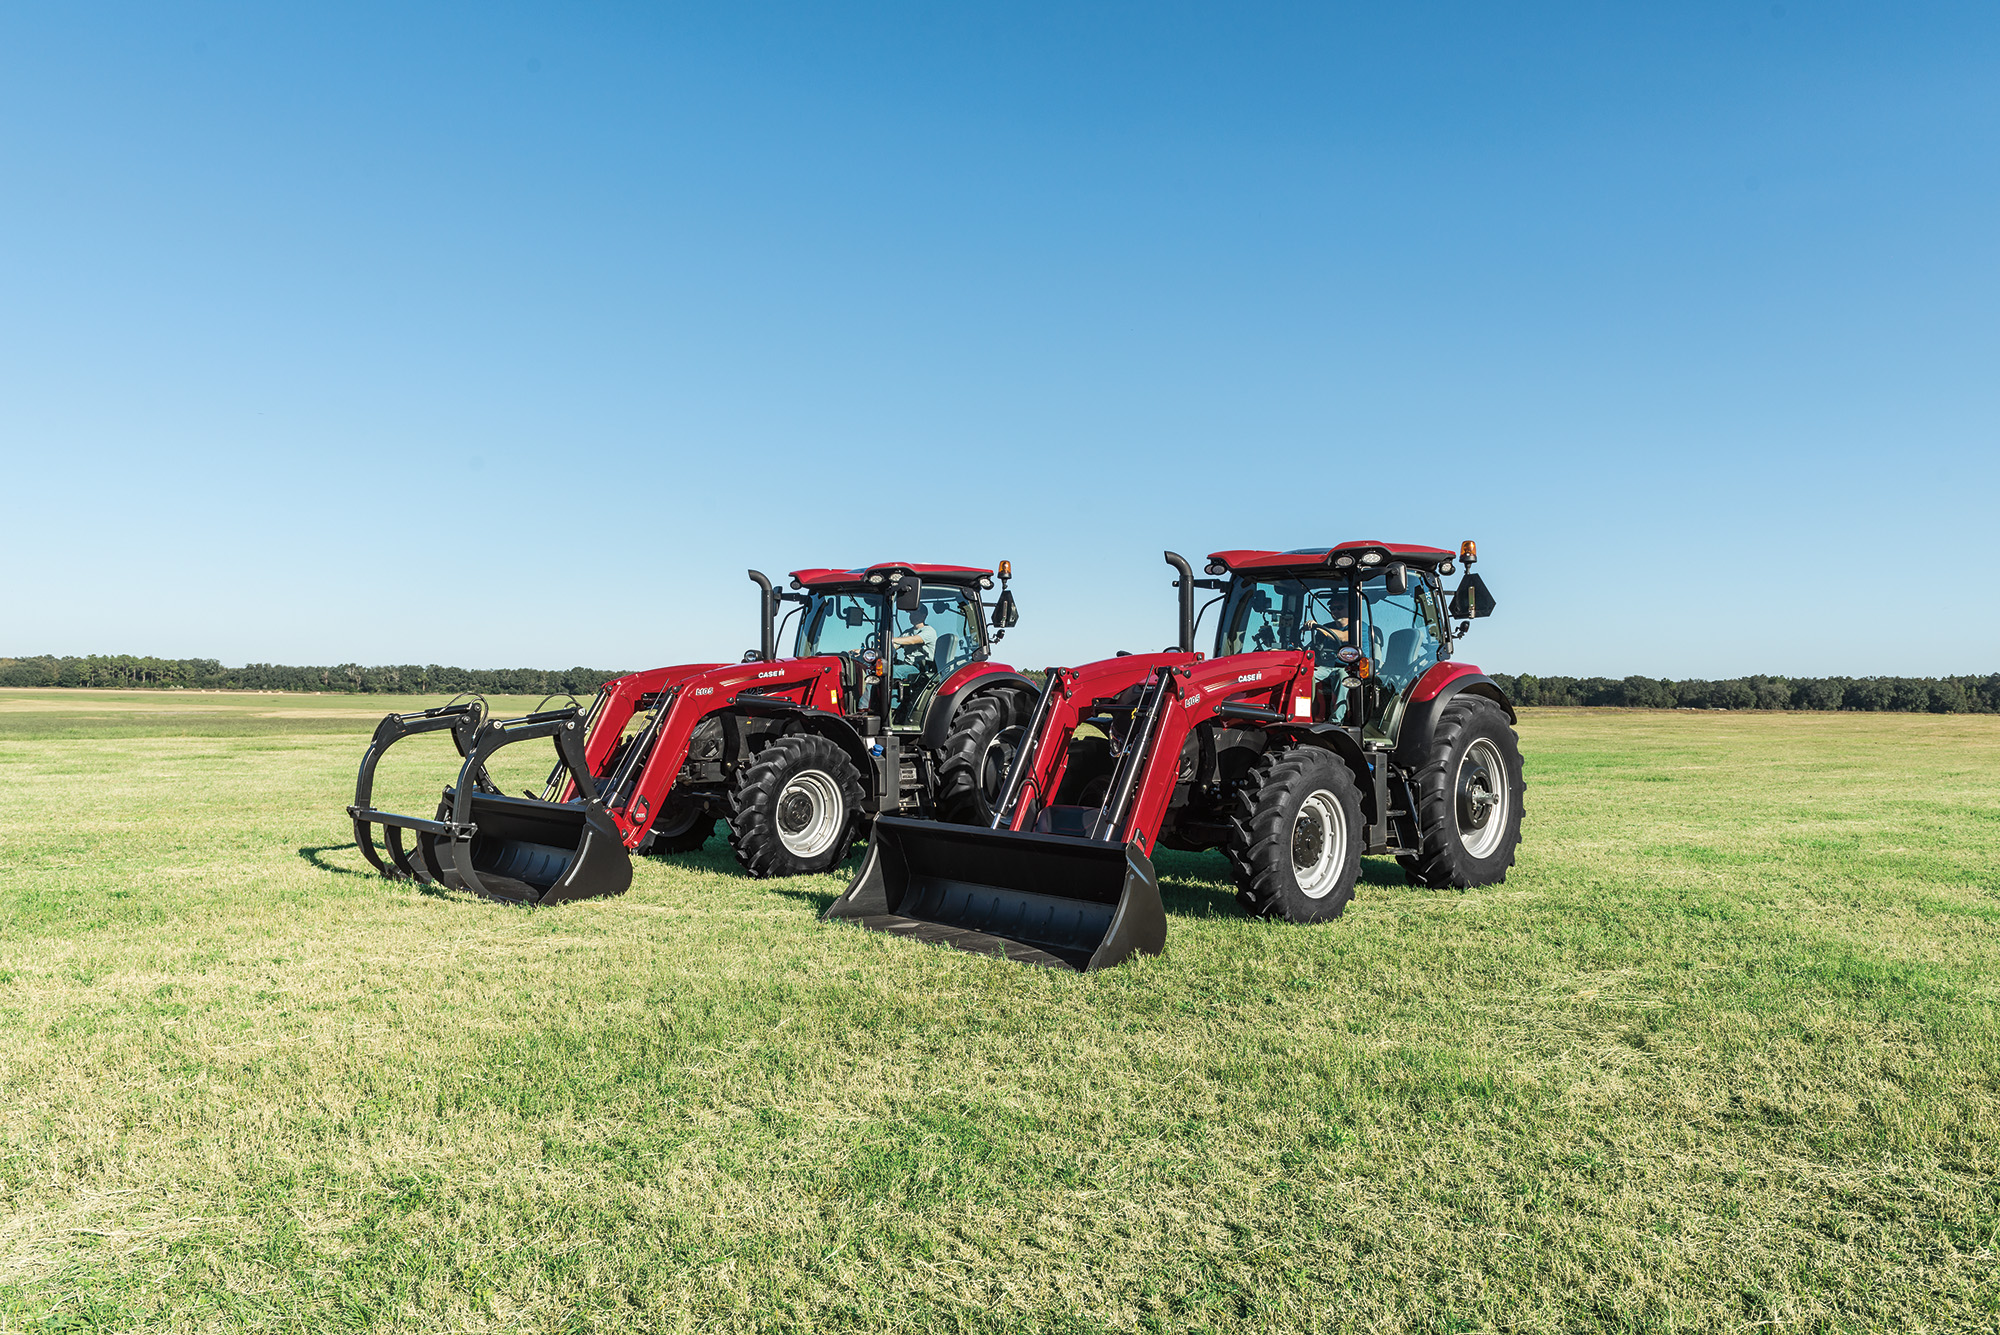 Agricultural Loaders Tuttle Motor & Hardware Poteet, TX (800) 880-8722